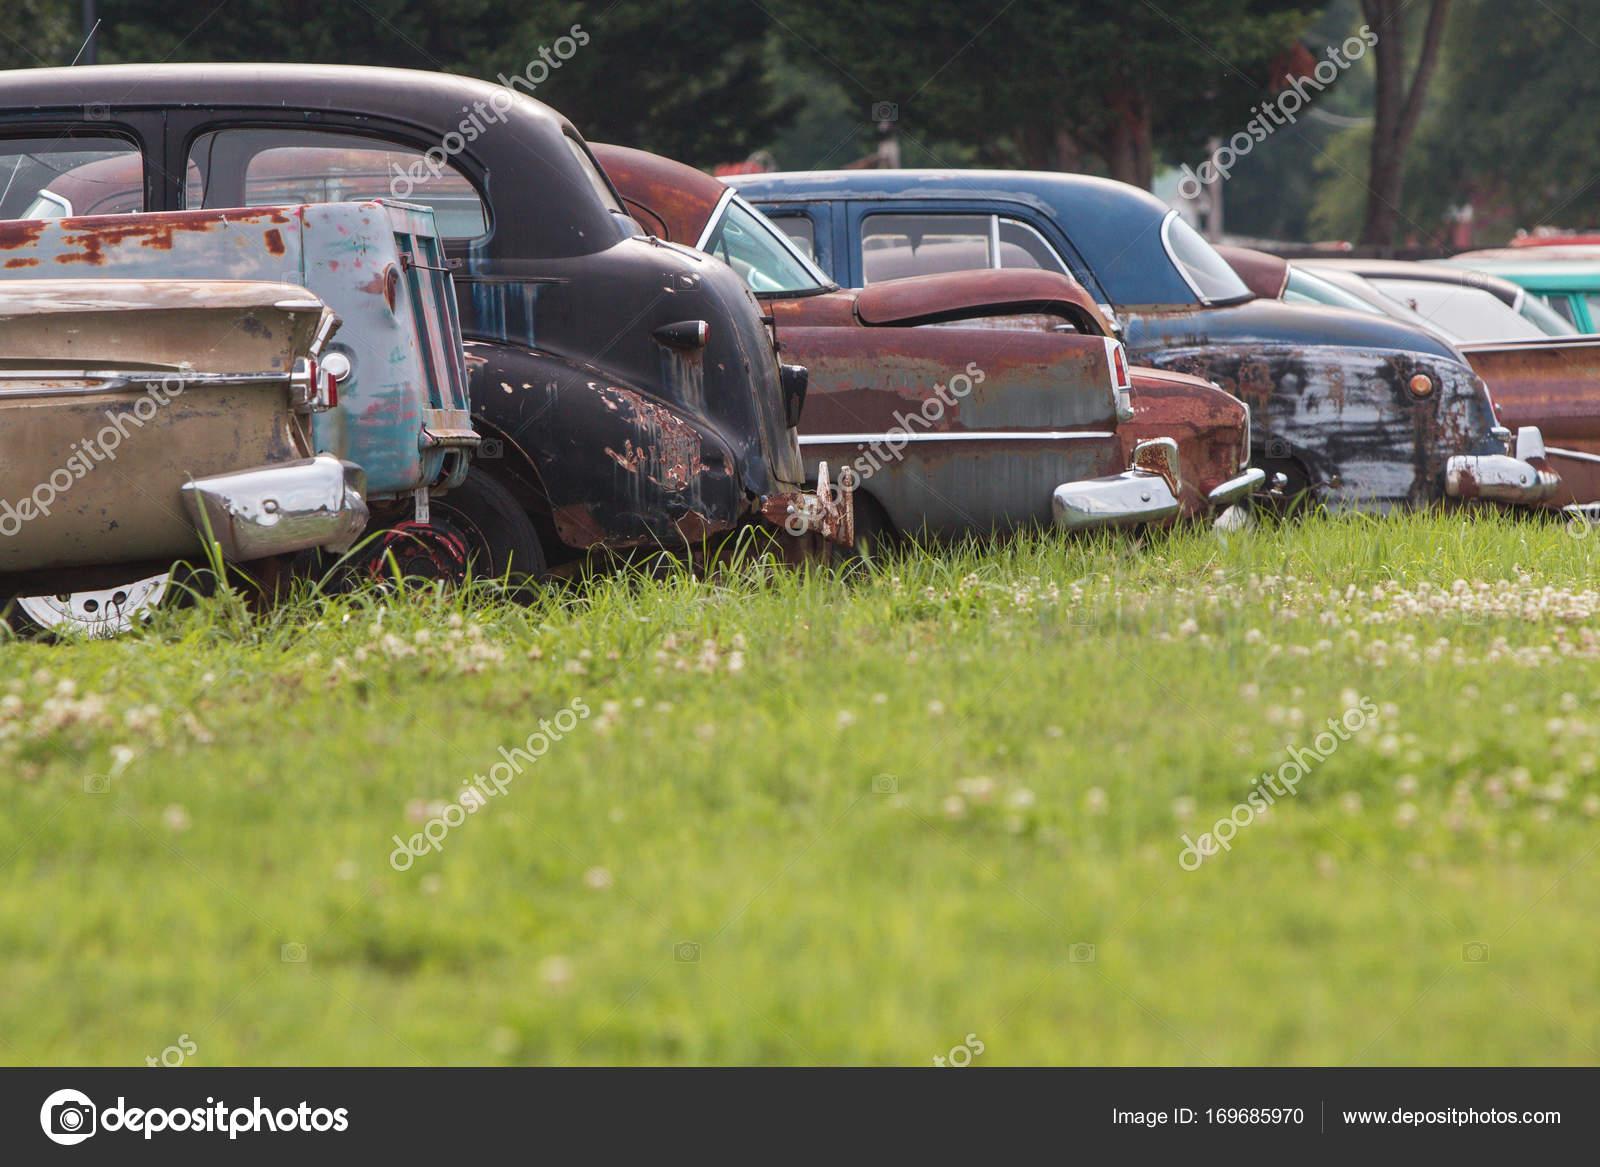 Rusted Antique Cars Sit In A Georgia Auto Junkyard — Stock Photo ...